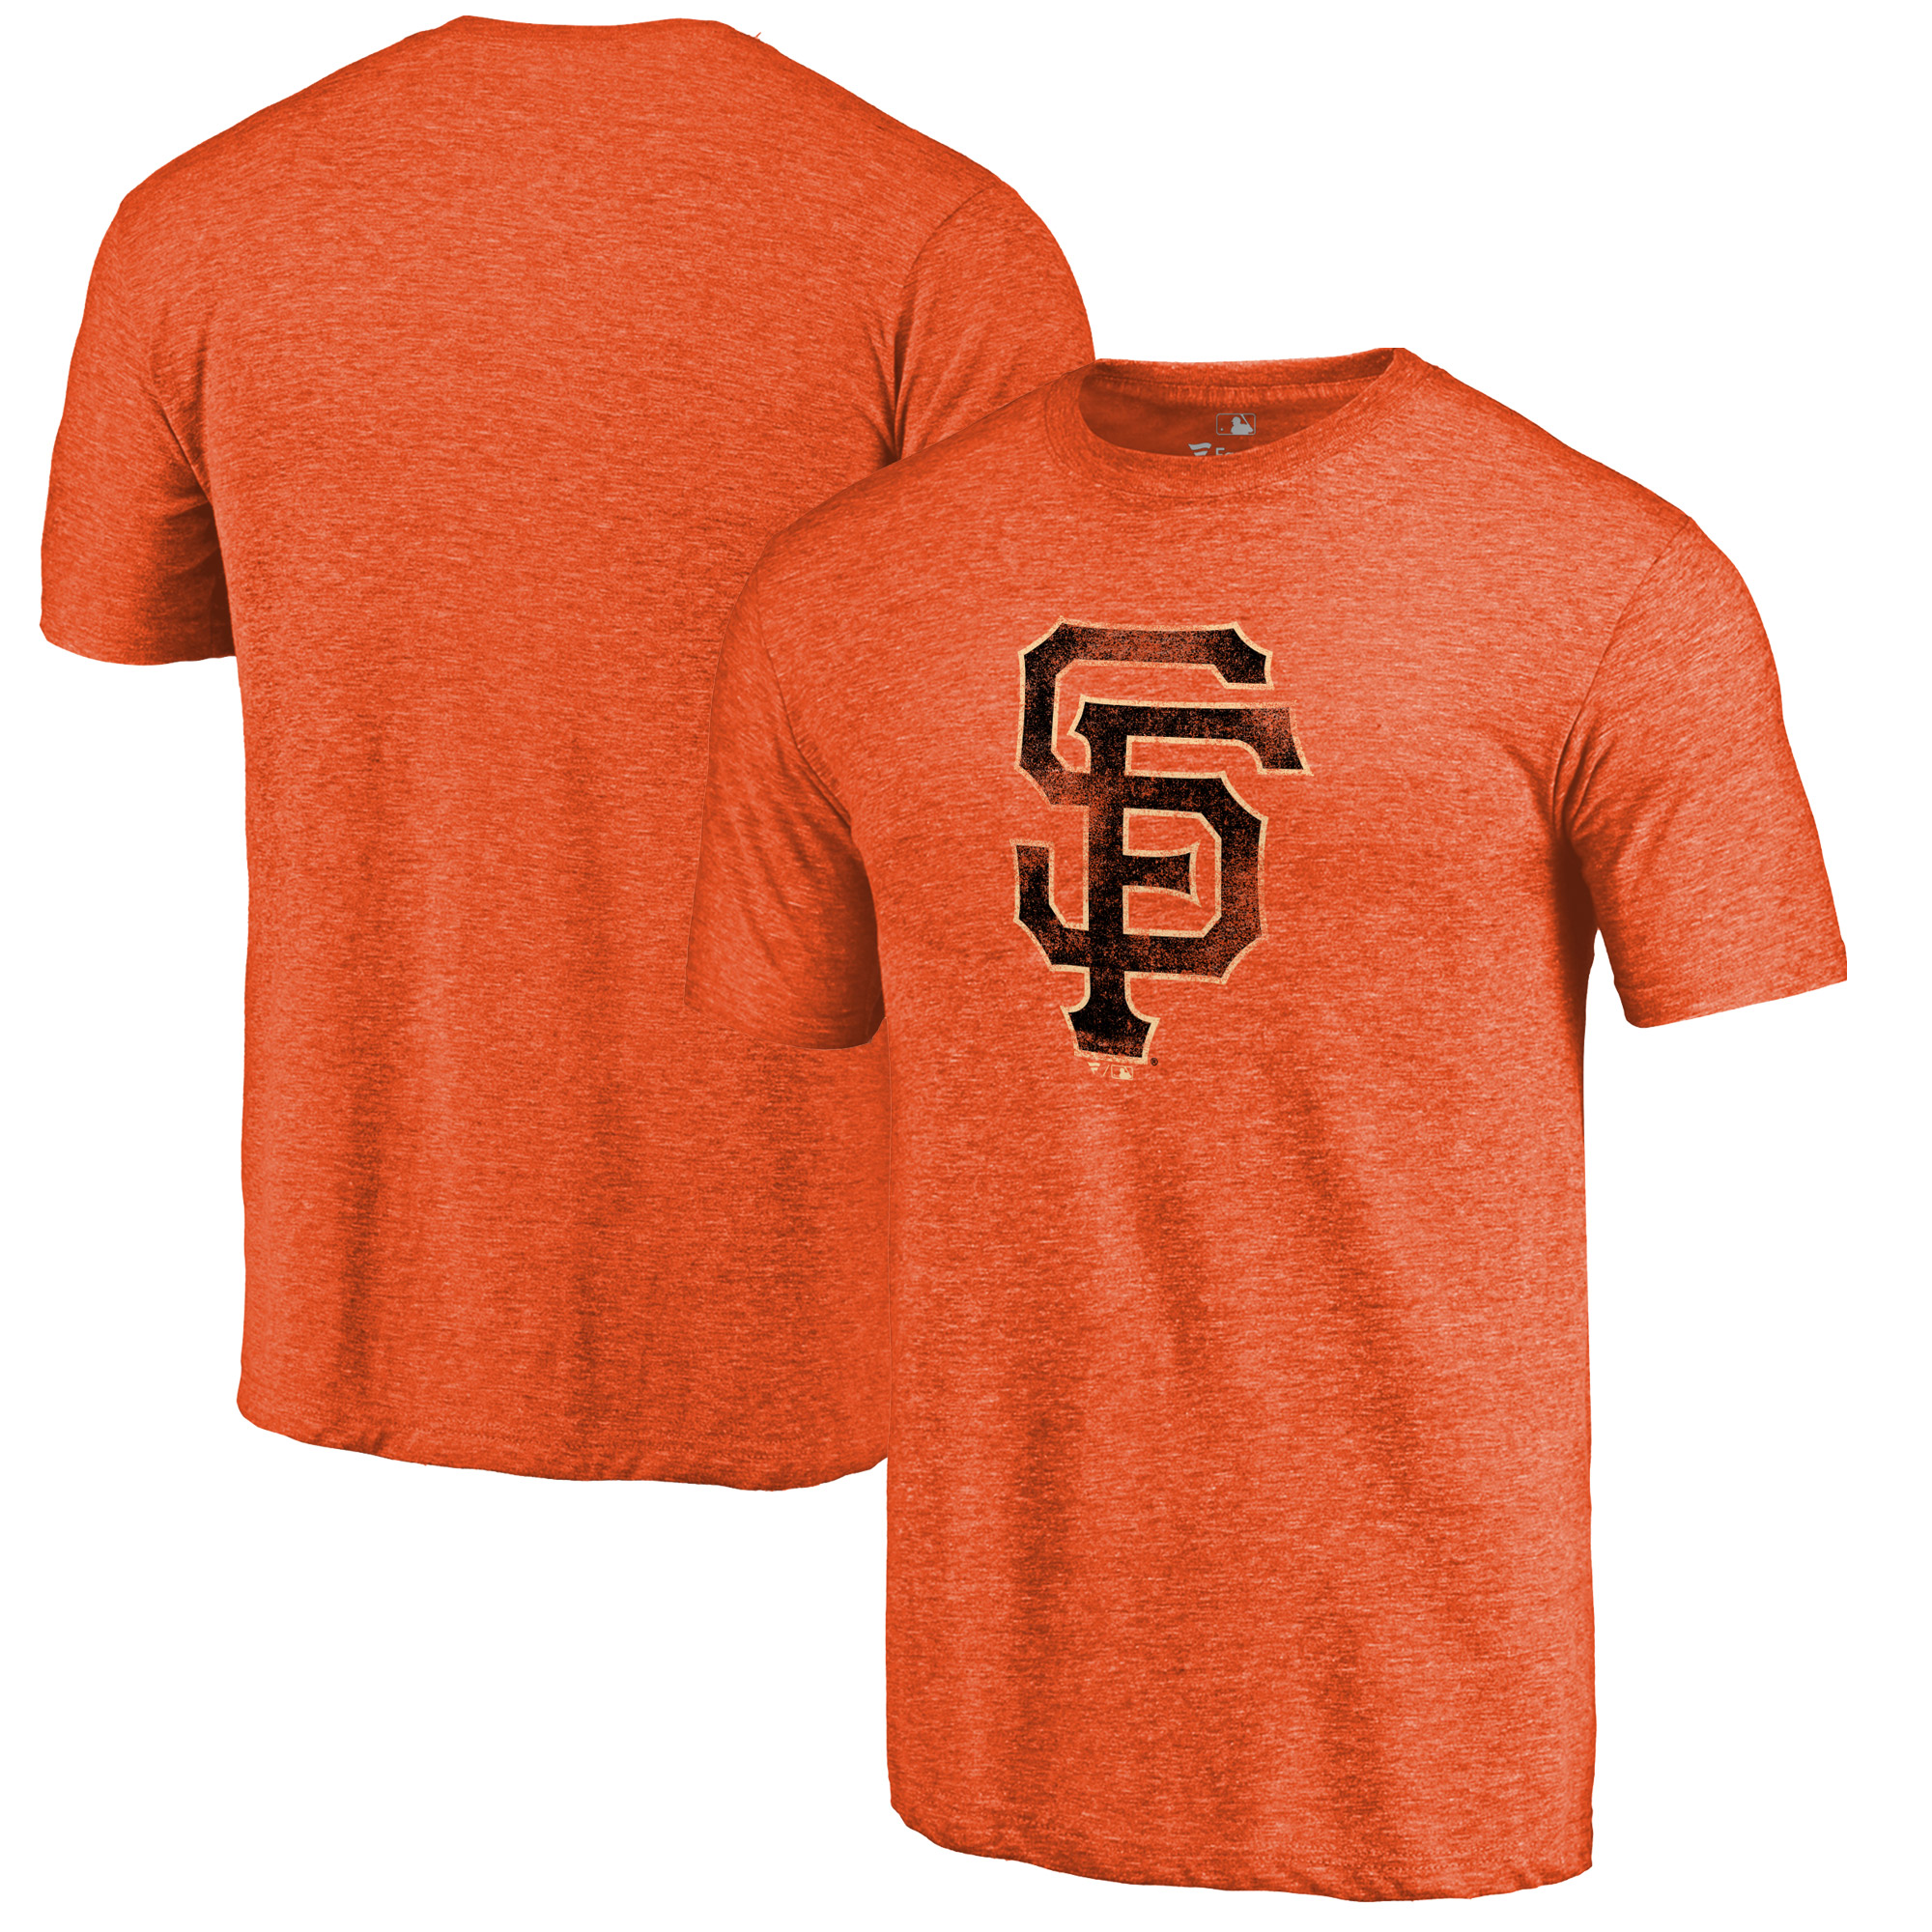 San Francisco Giants Distressed Team Tri-Blend T-Shirt - Heathered Orange